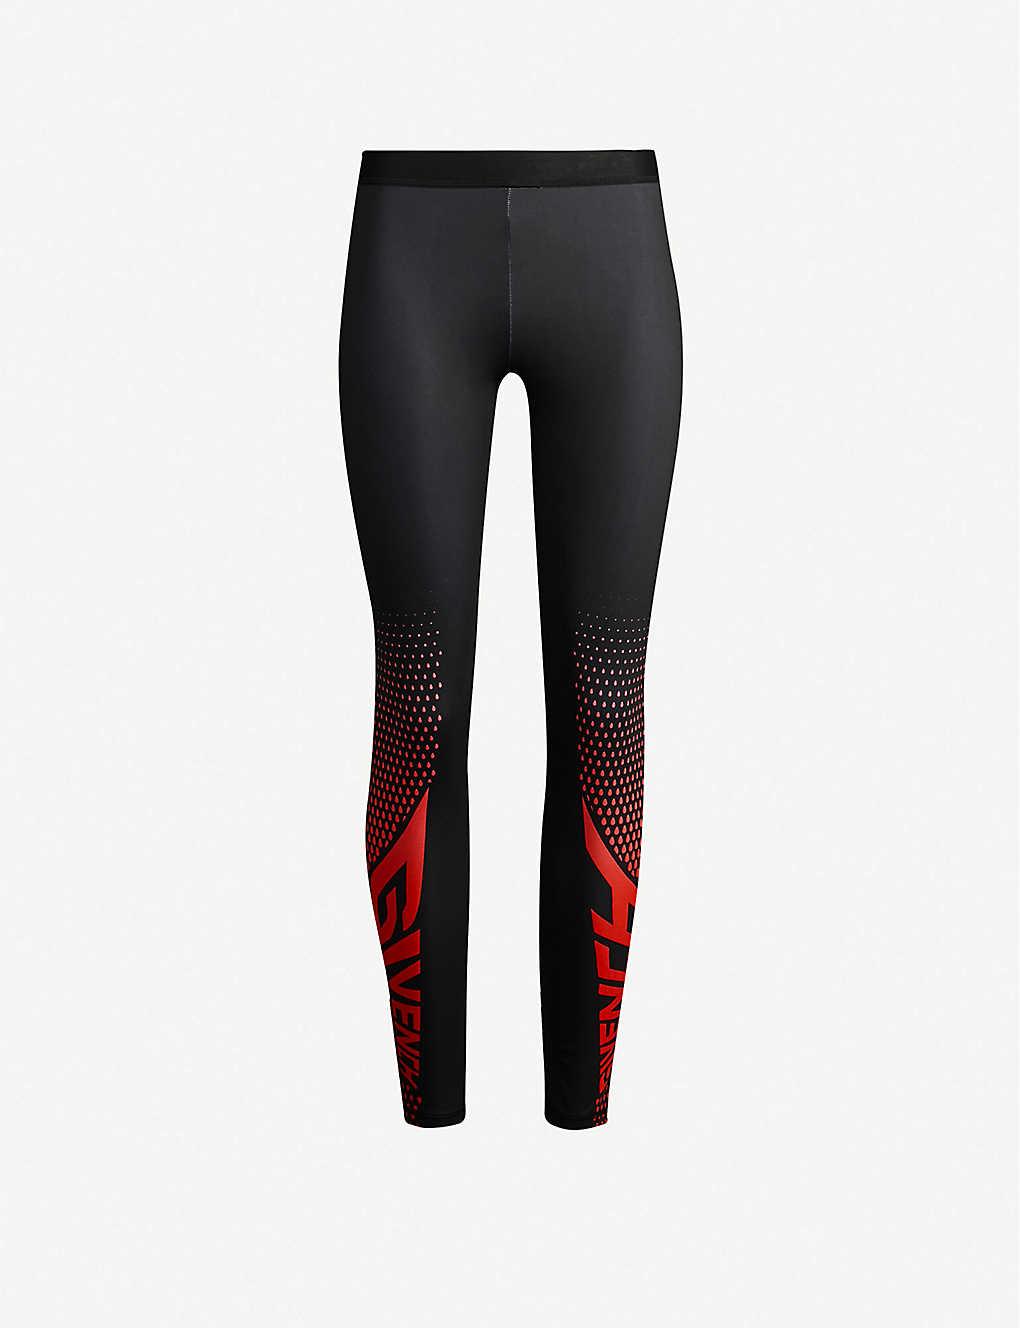 50cc3e54d8b84 GIVENCHY - Logo-print stretch-jersey leggings | Selfridges.com